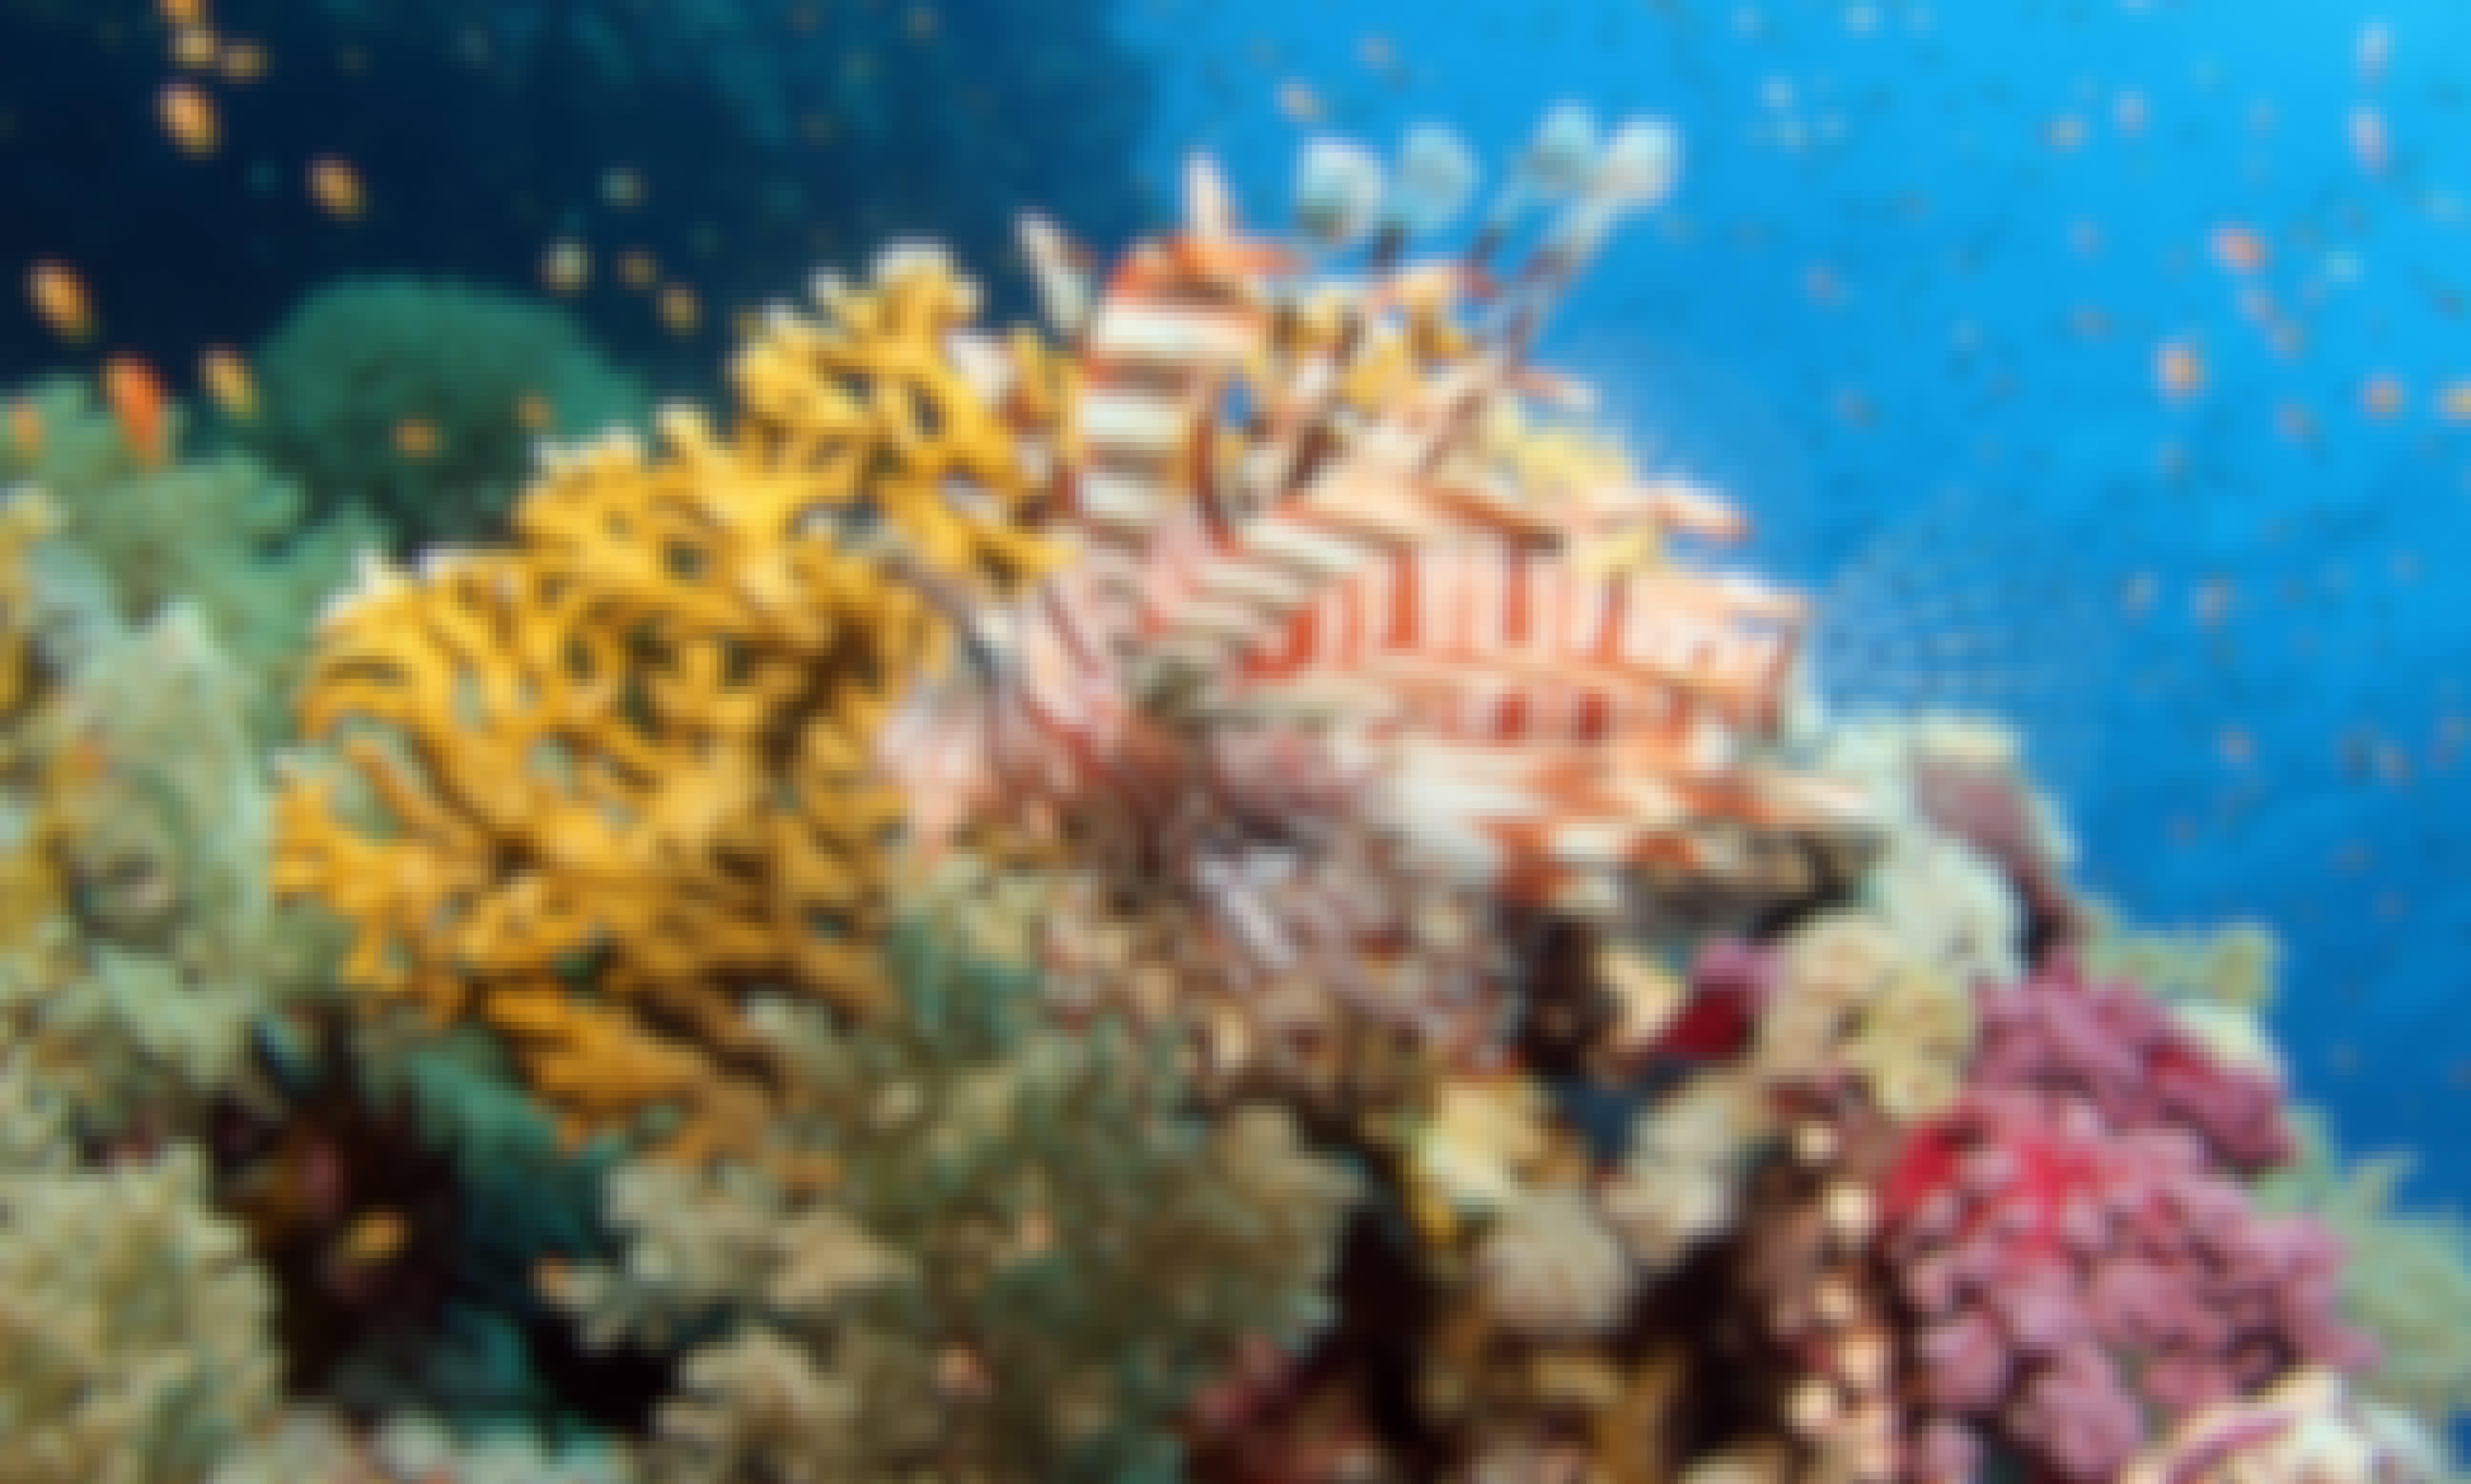 Enjoy Daily Diving Boat in Sharm el Sheikh, Egypt